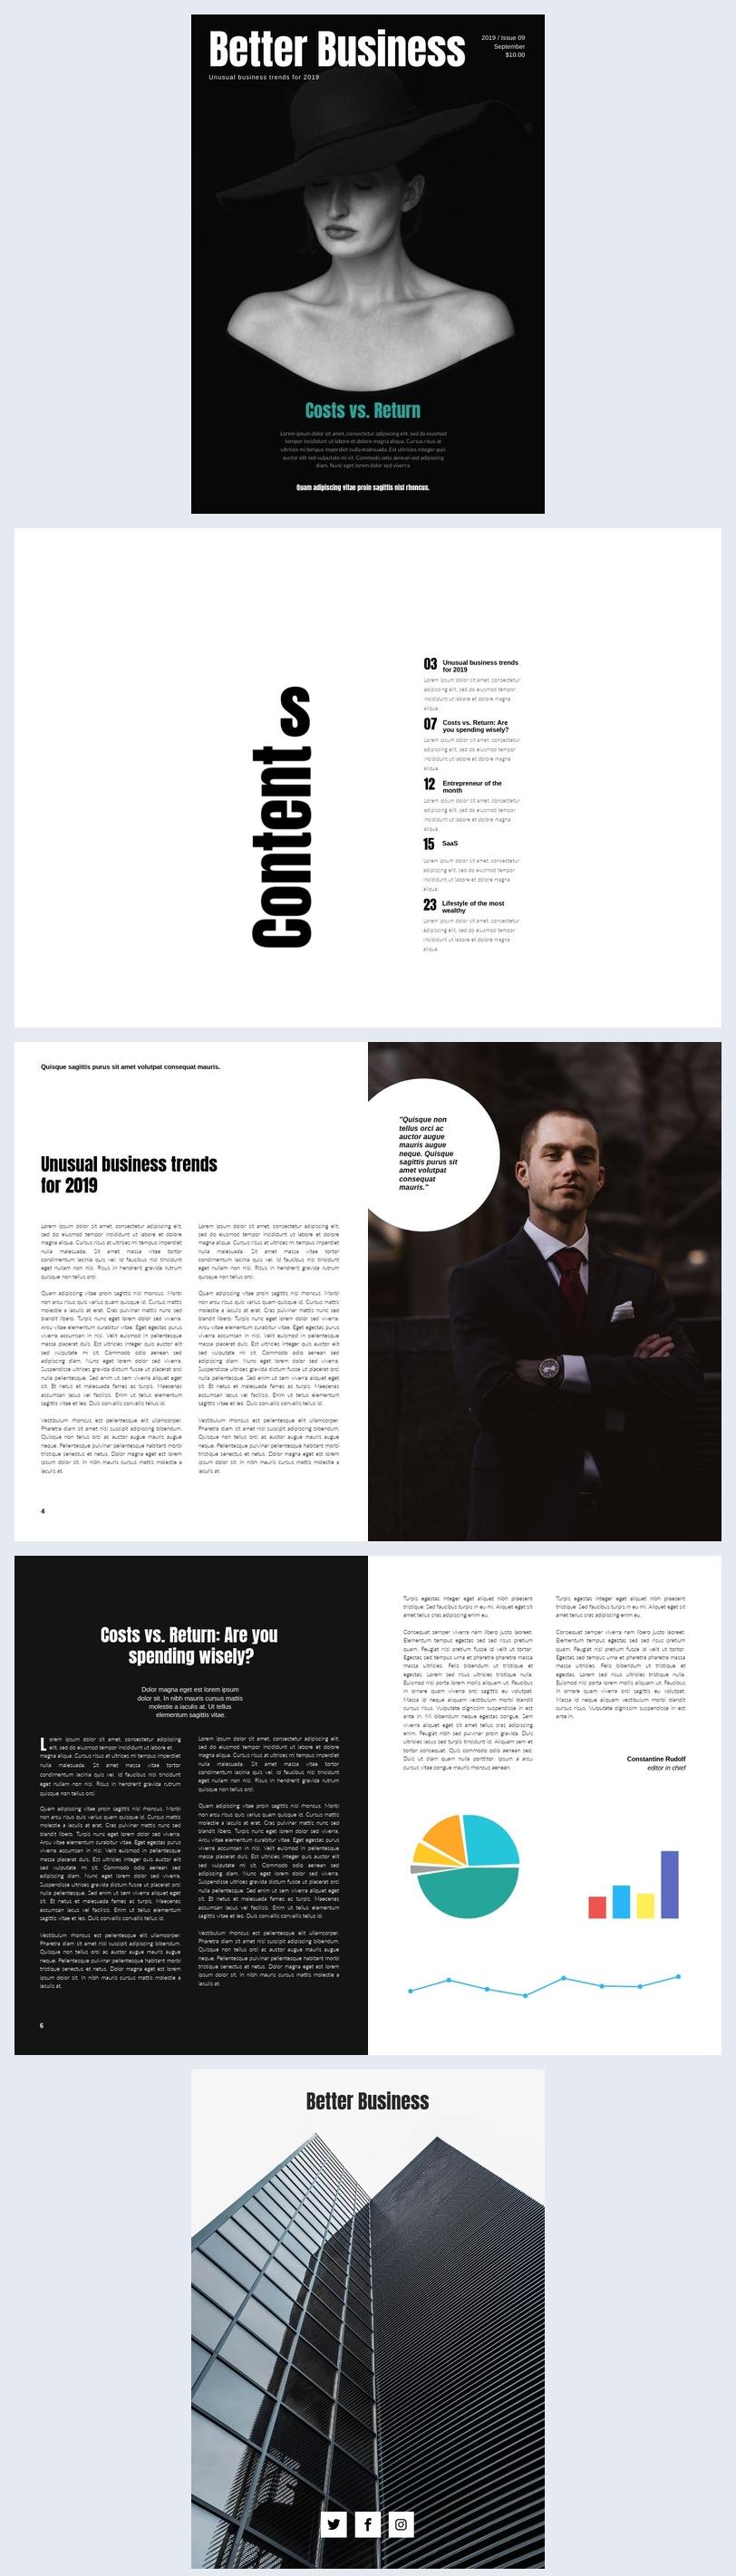 Business Magazine Layout